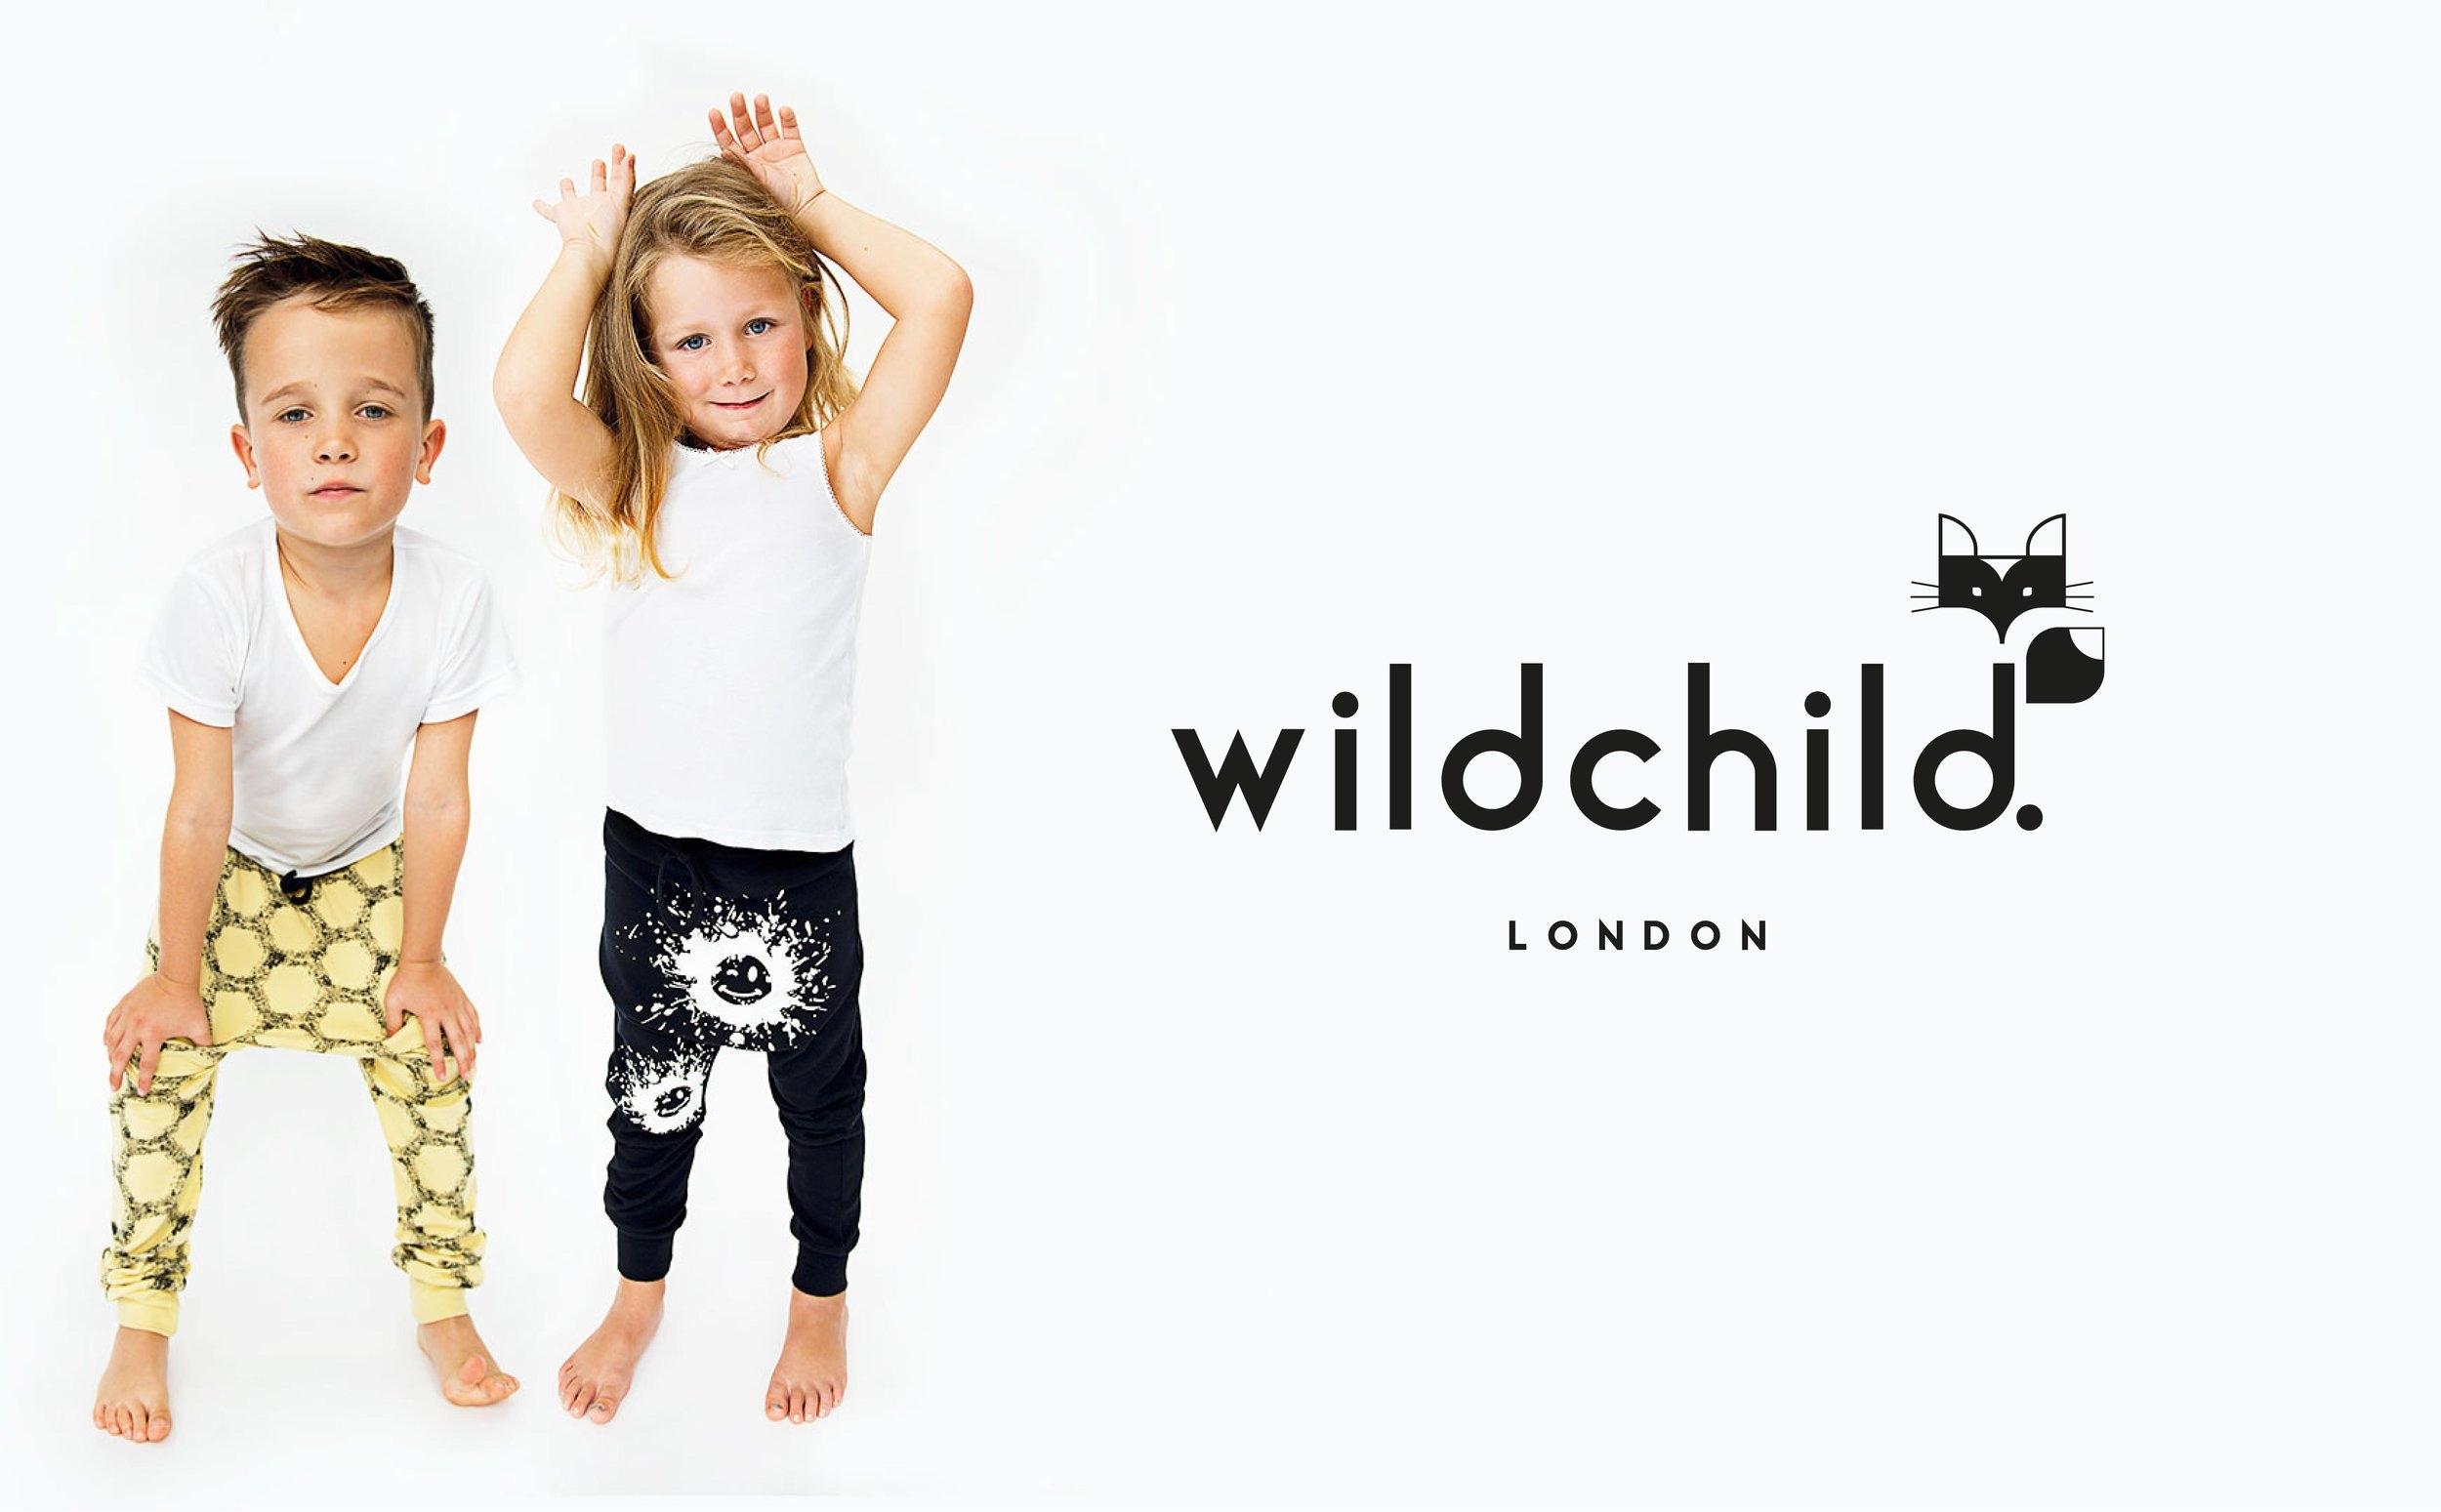 WILDCHILD_LONDON.2-01.jpg